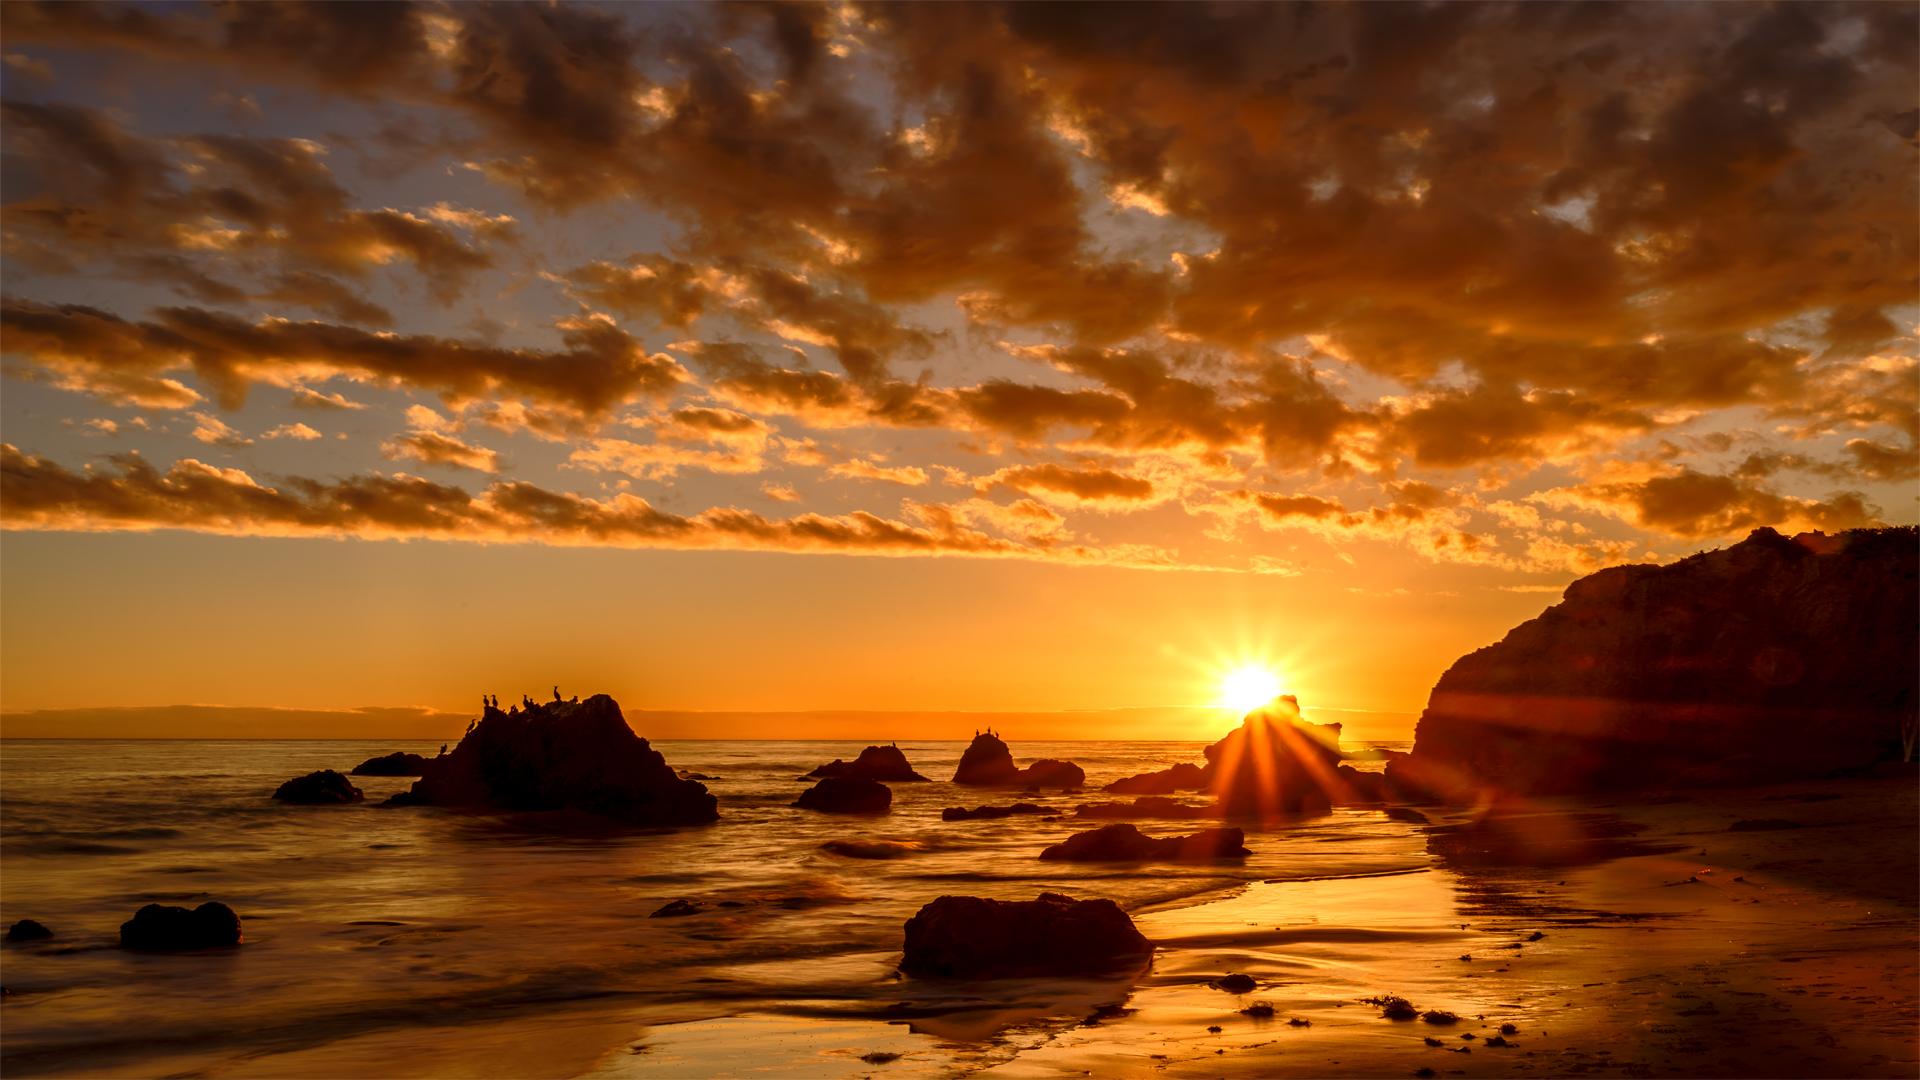 El Matador Beach Sunset1 2-13-18